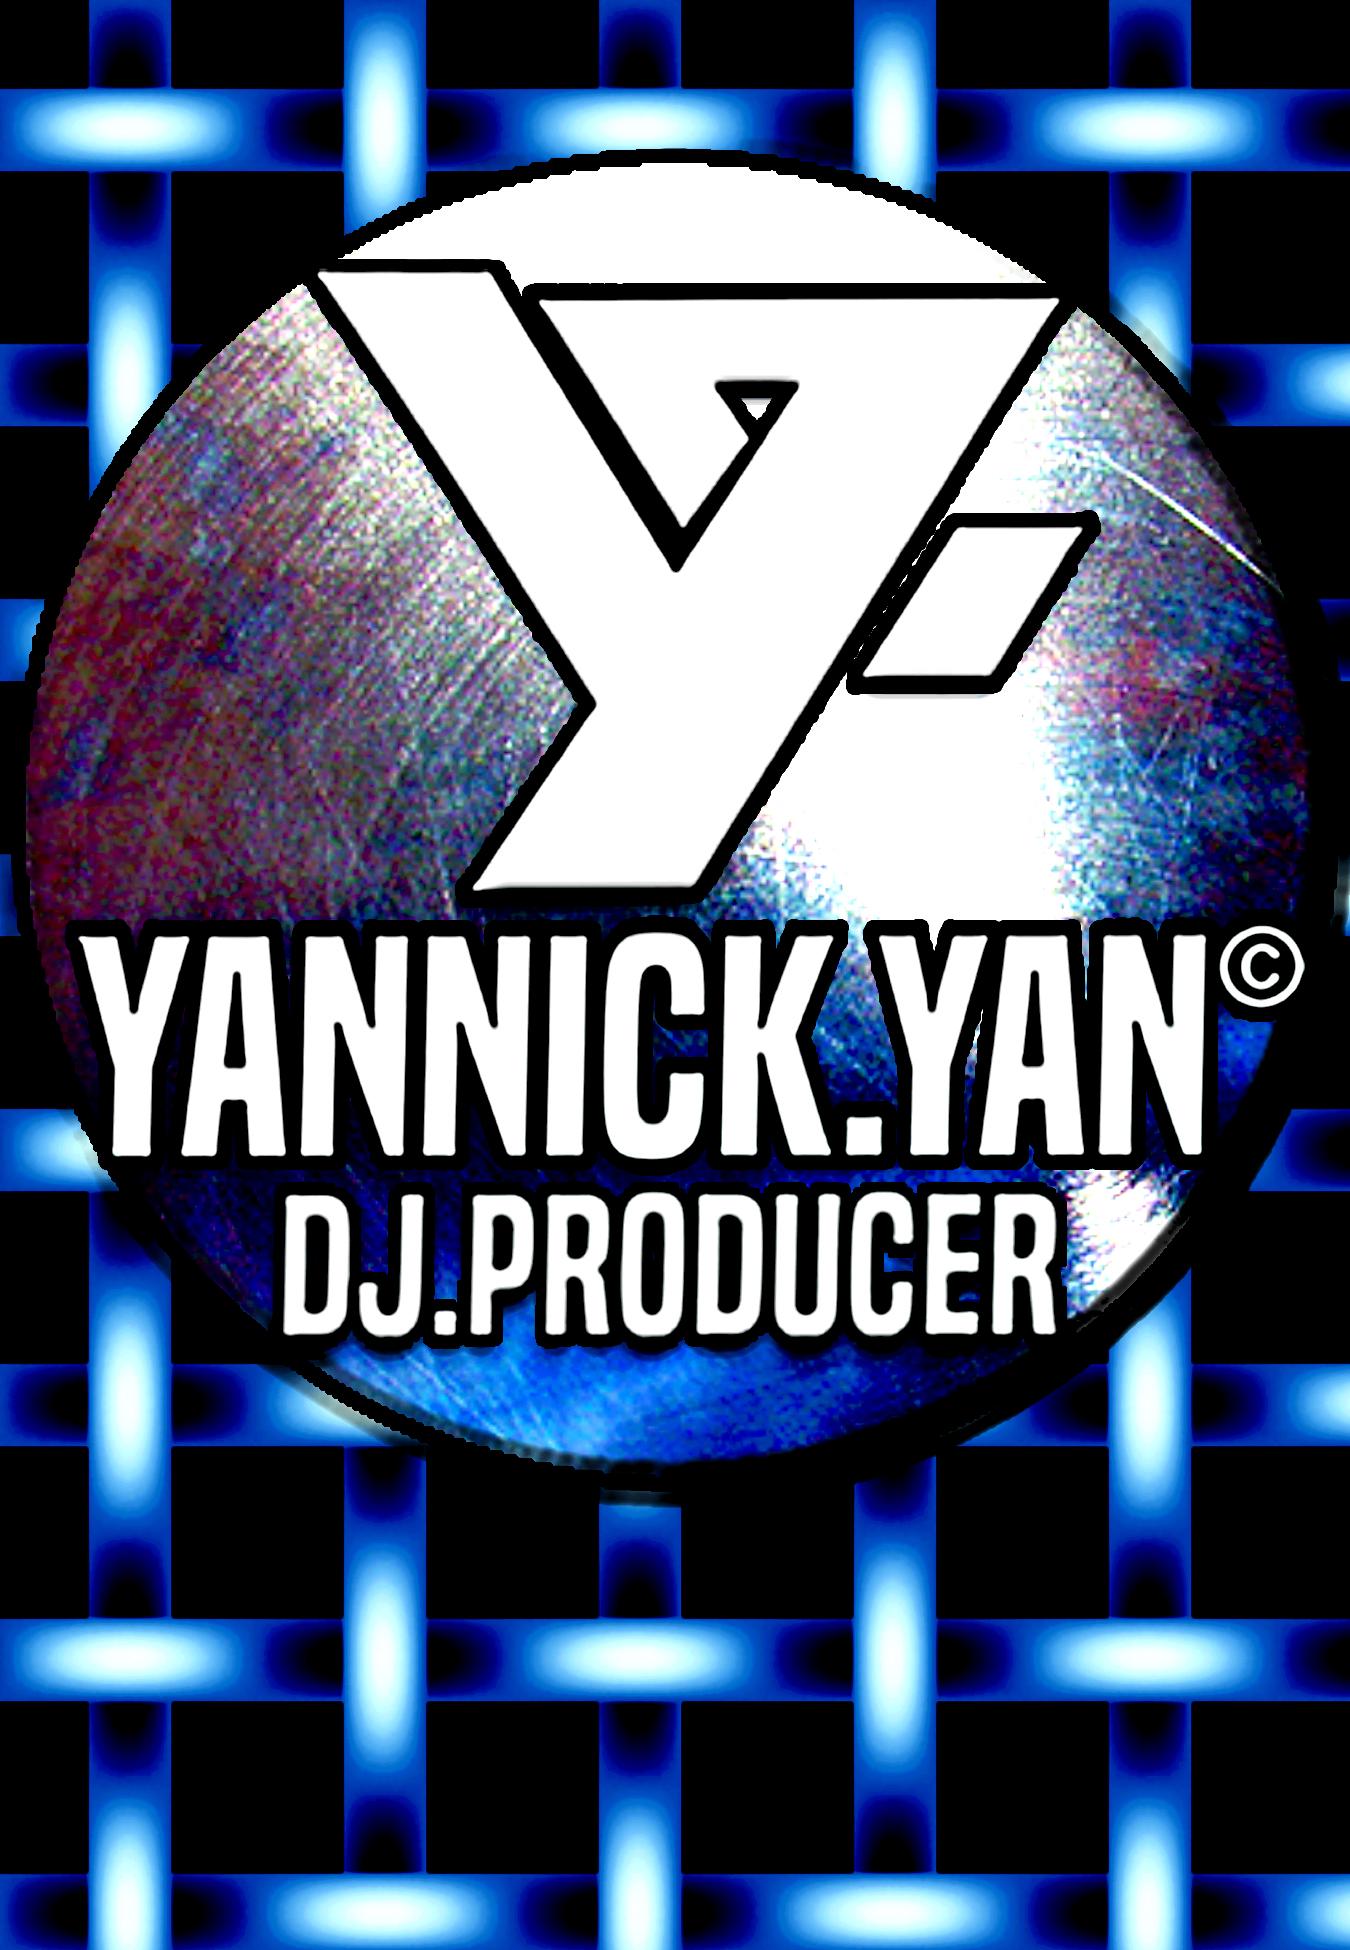 https://panoramix-radio-station.com/wp-content/uploads/2016/12/YY-logo-2017.jpg